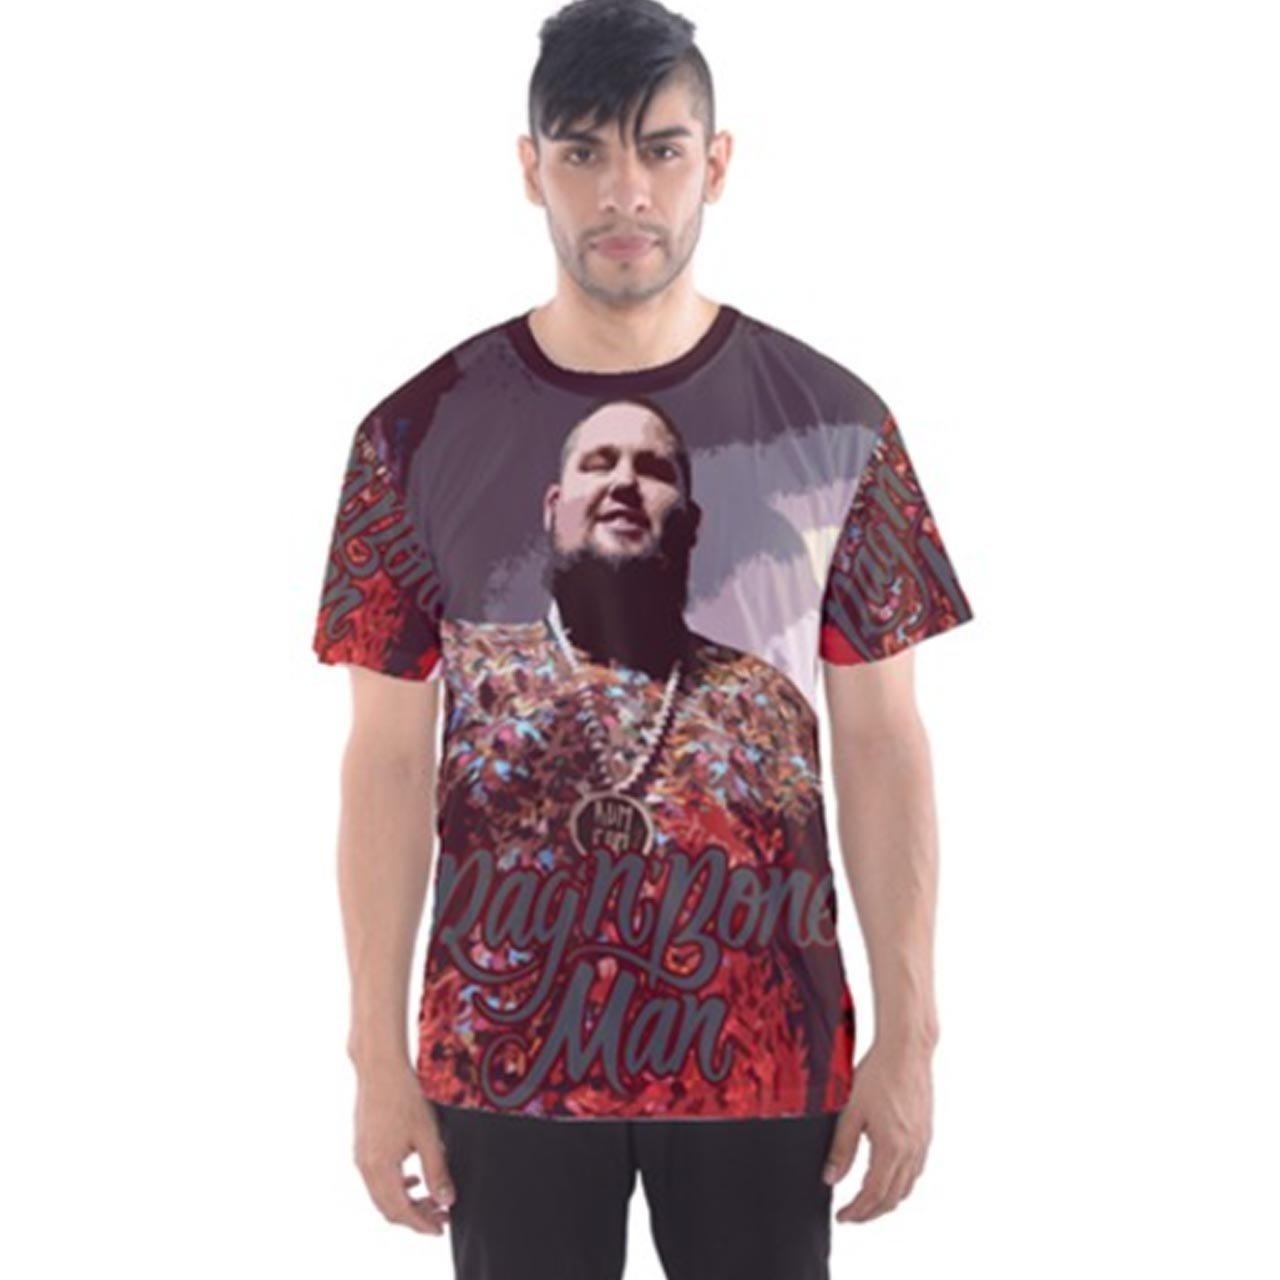 Rag N Bone Fullprint TeeメンズTシャツTee Fullprint TシャツサイズM N TシャツサイズM B075TS765D, 山崎屋:64278dba --- ijpba.info